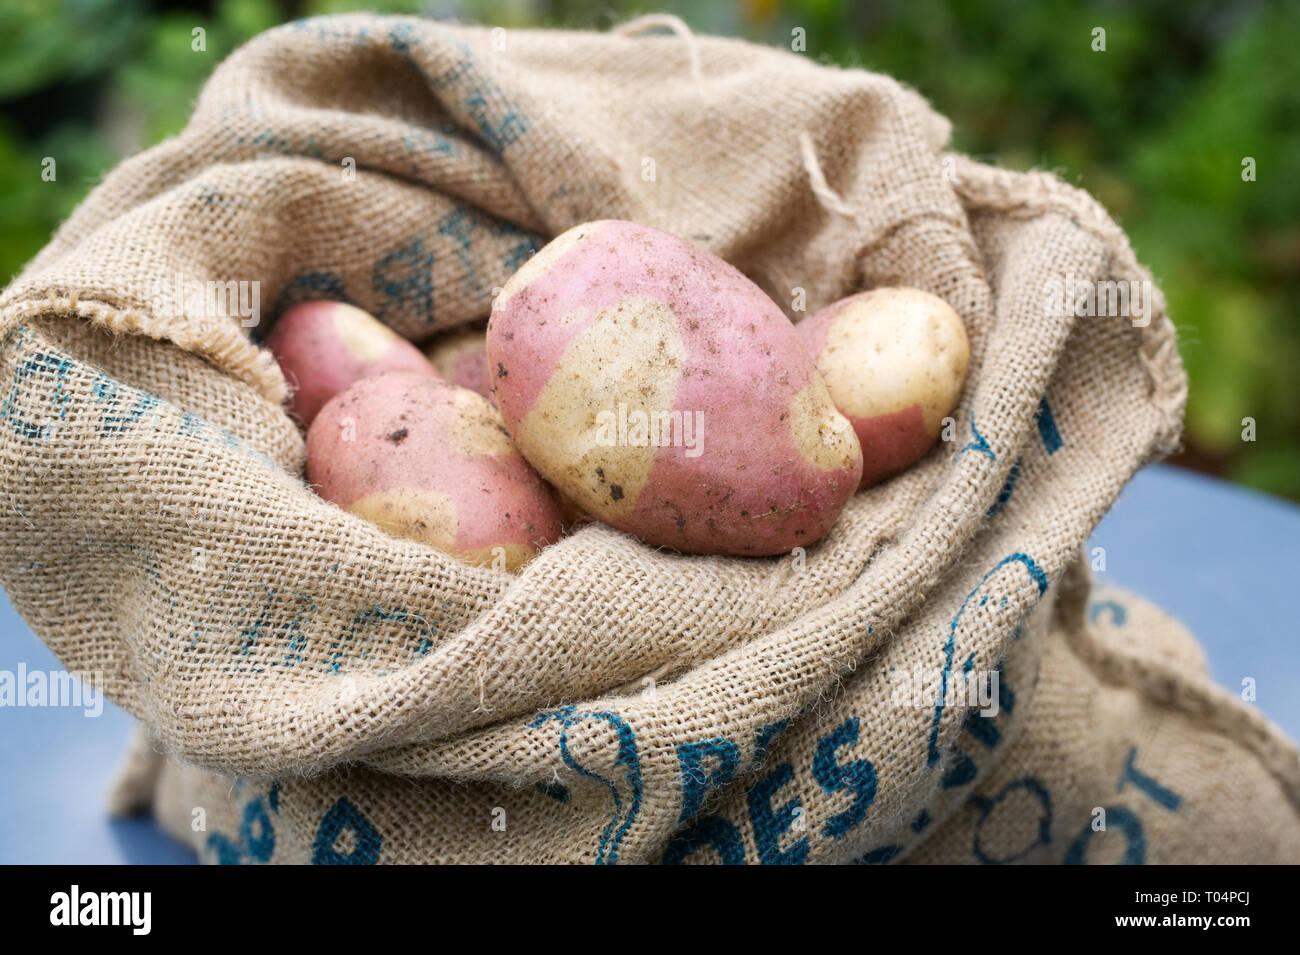 Solanum tuberosum 'Pink Gypsy'. Freshly harvested Potato 'Pink Gypsy' in a hessian sack. - Stock Image